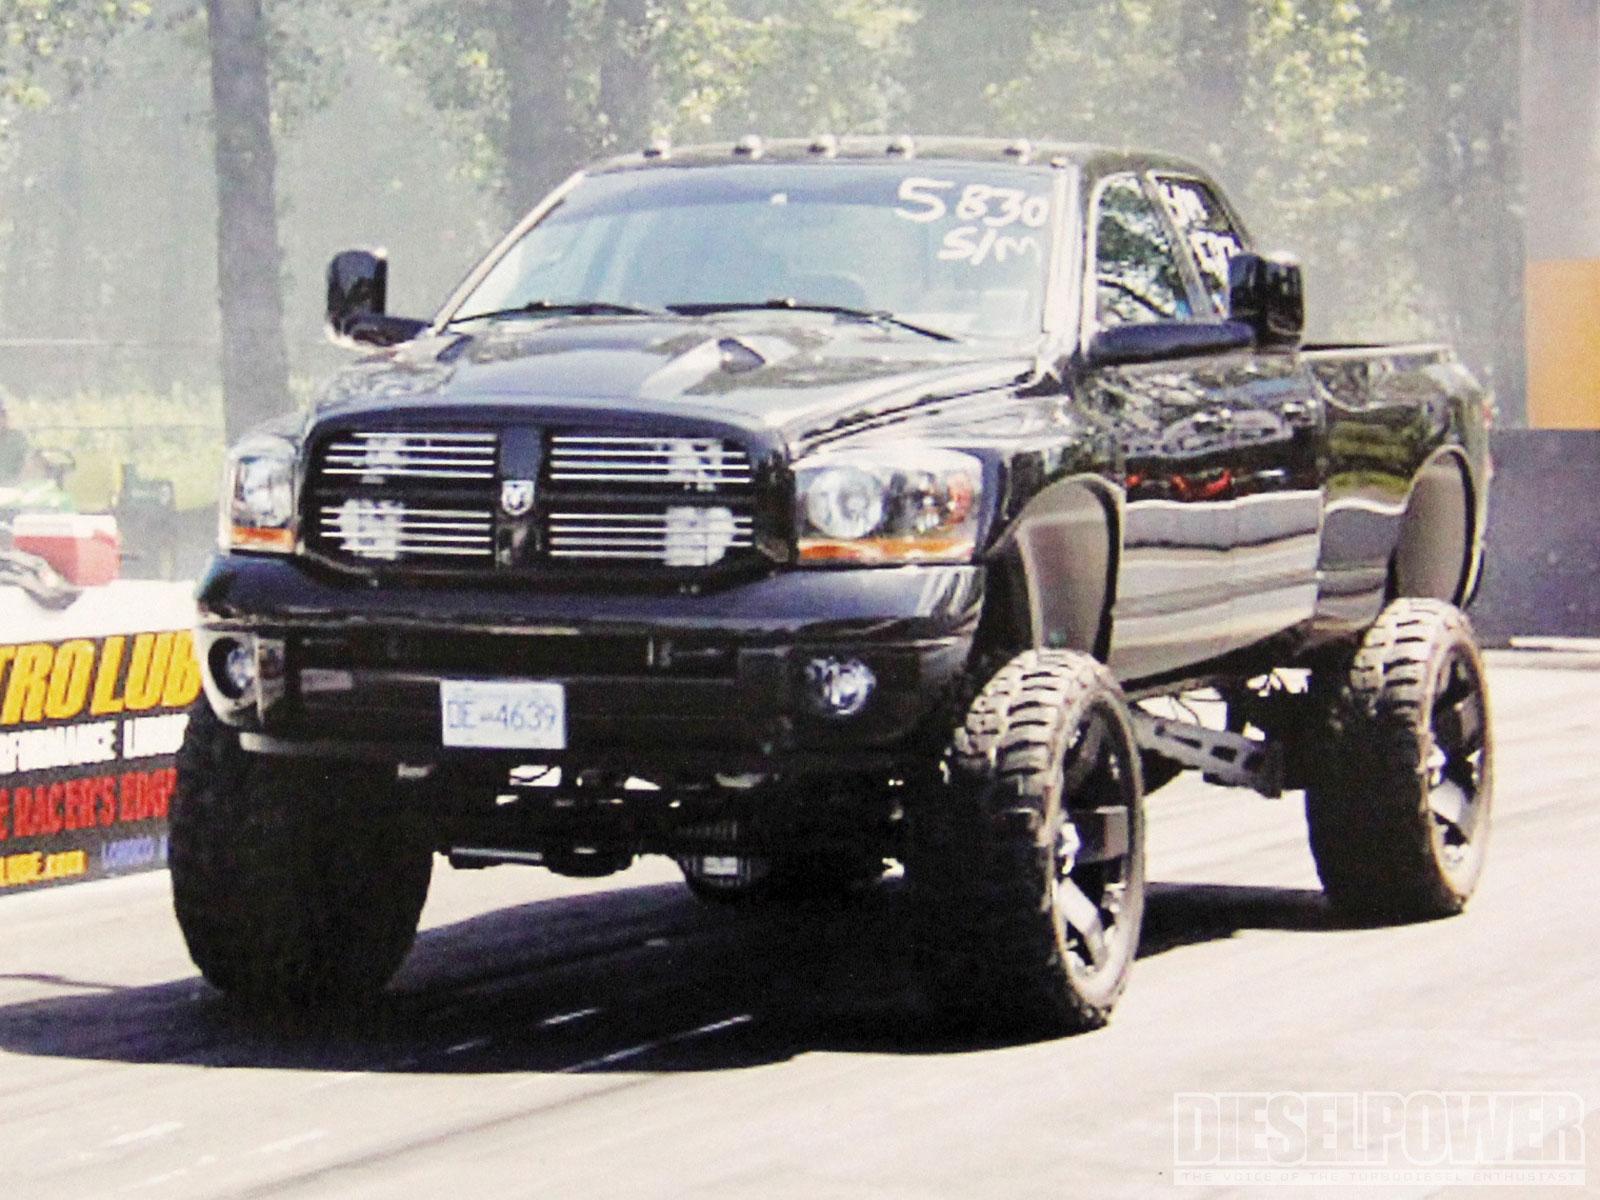 Dodge Ram 3500 Wallpapers Vehicles Hq Dodge Ram 3500 Pictures 4k Wallpapers 2019